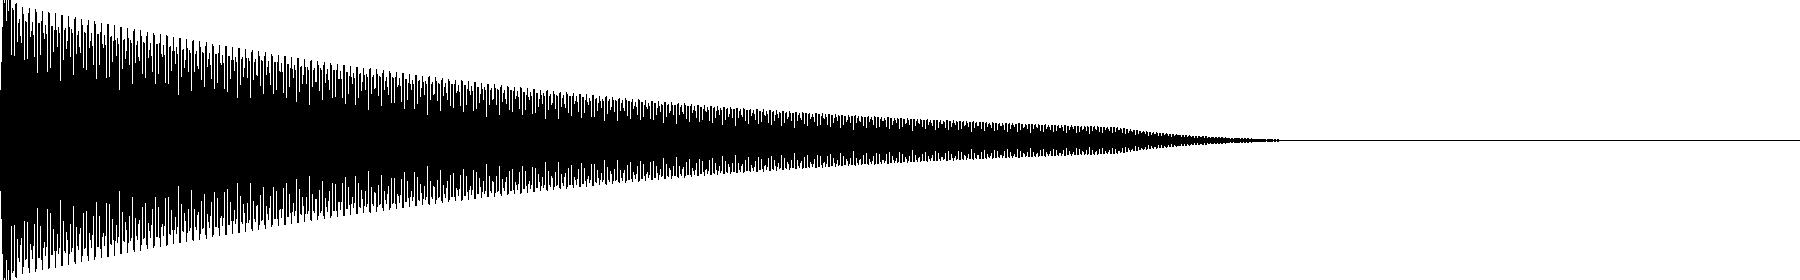 808 01